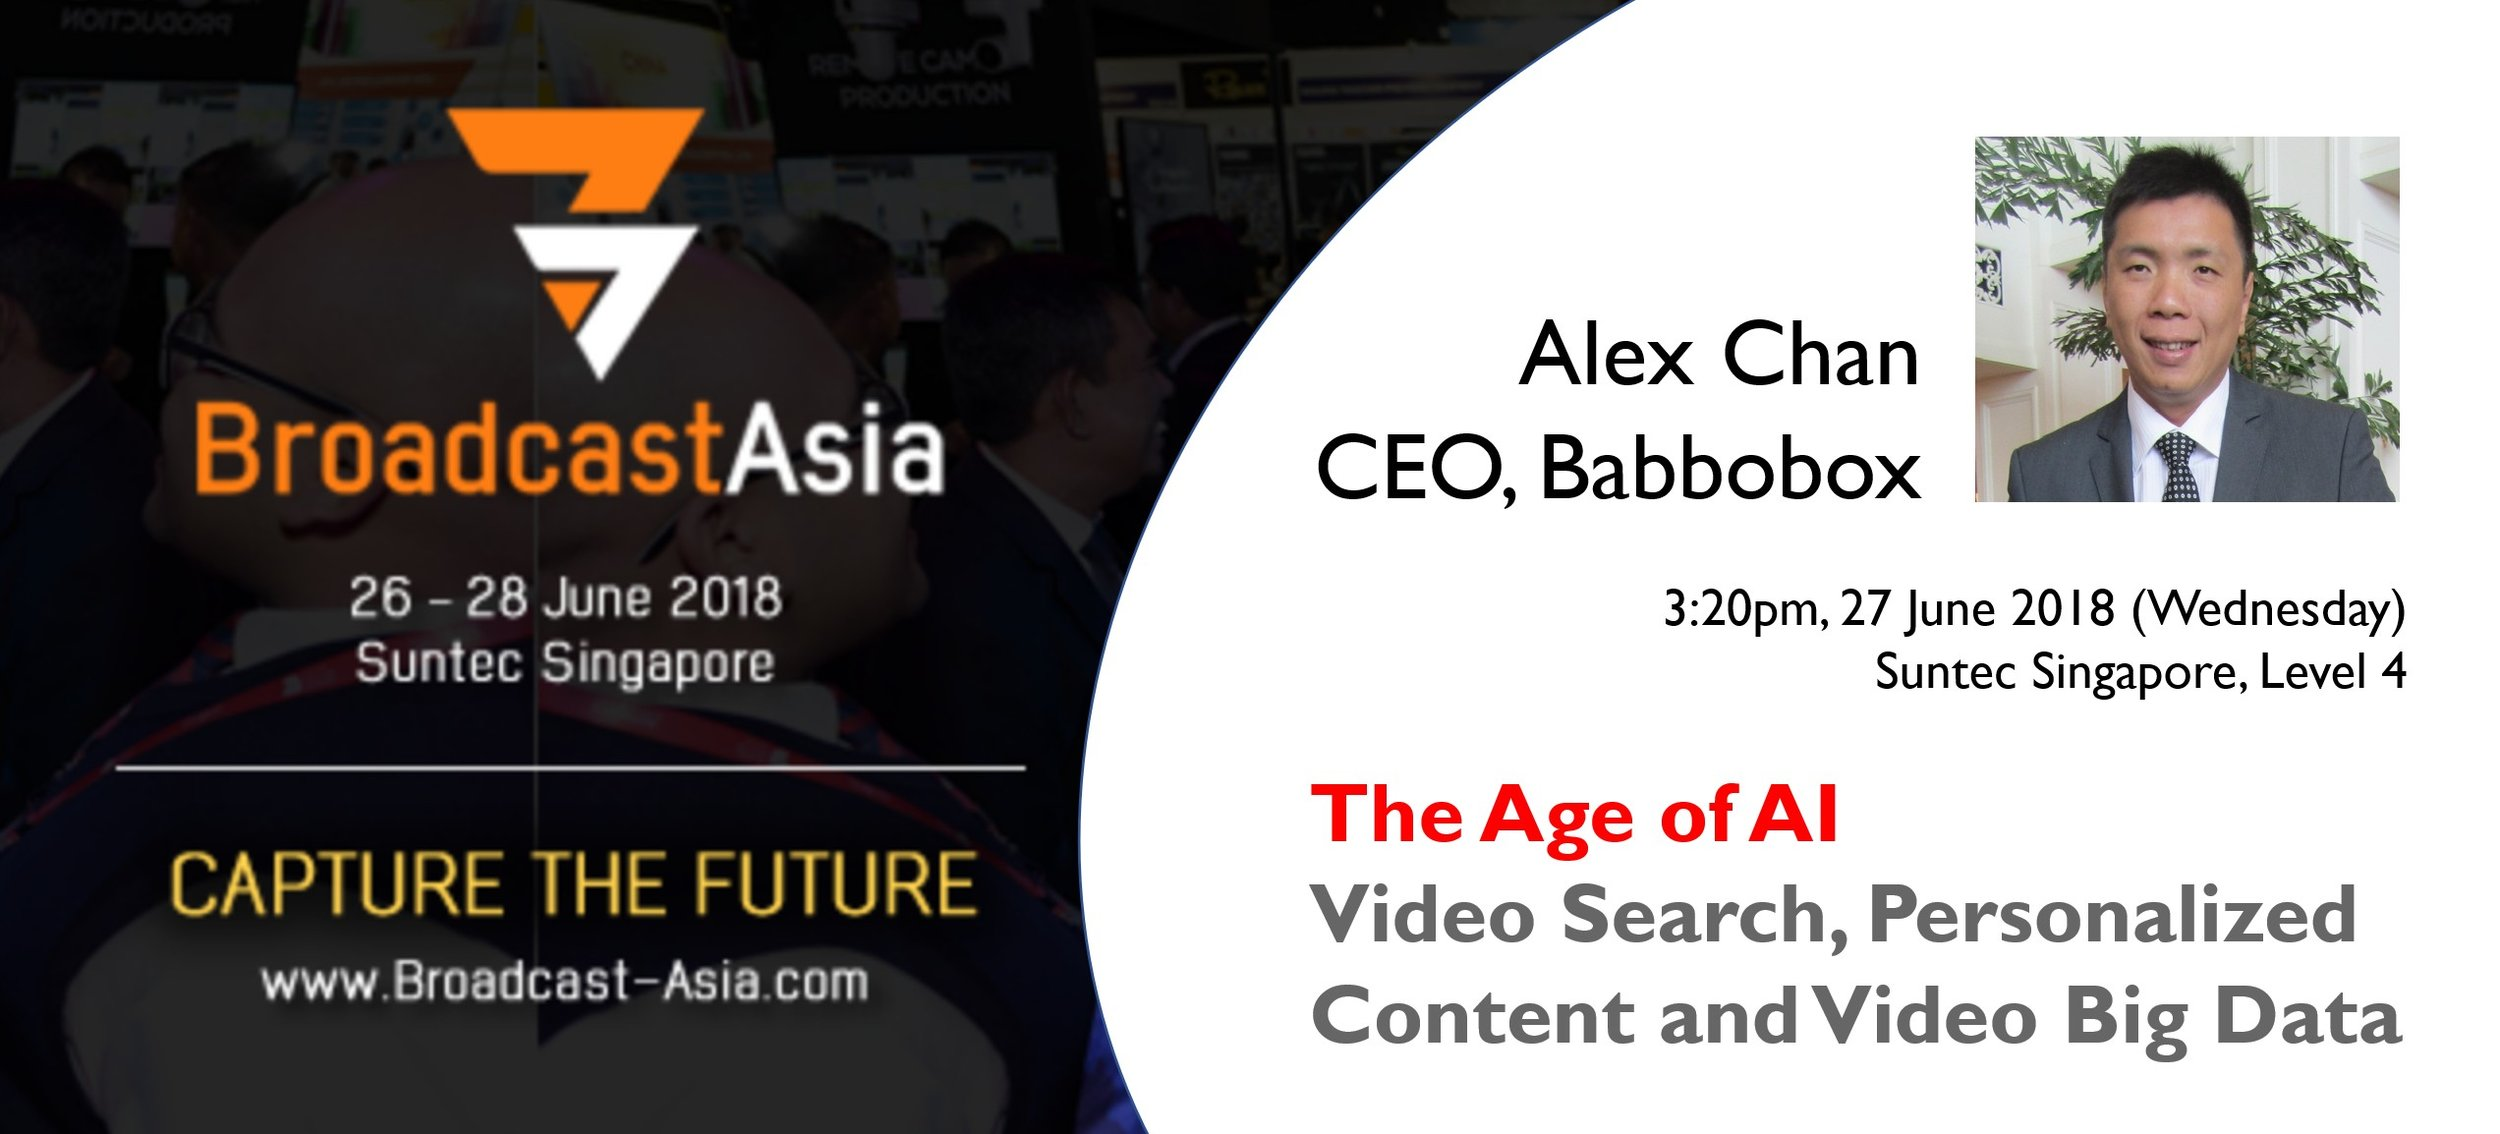 alex-chan-babbobox-videospace-broadcast-asia.jpg